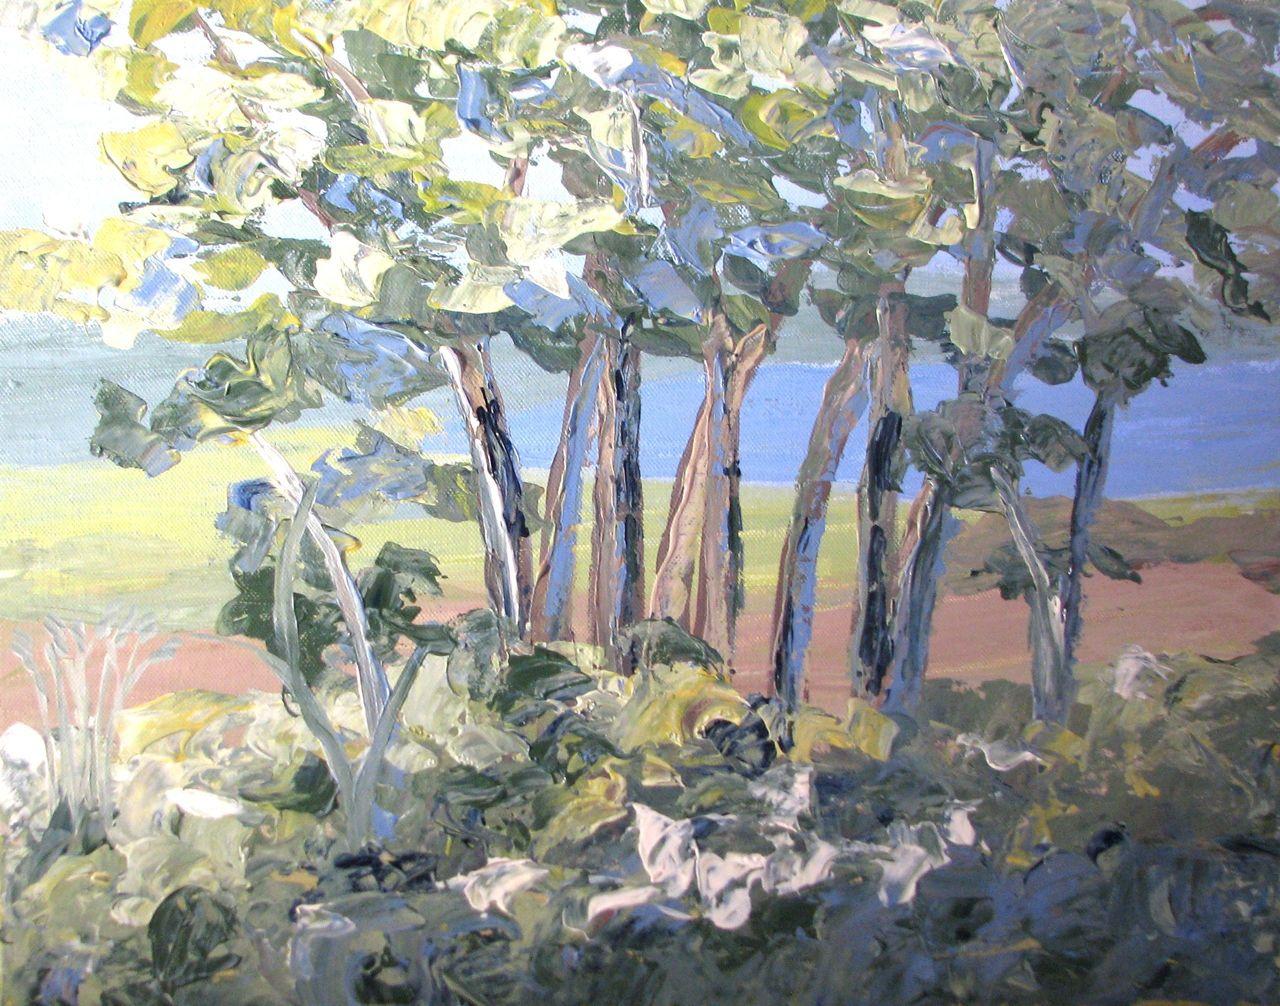 Landschaftsmalerei impressionismus  Baumgruppe - Baum, Impressionismus, Landschaftsmalerei, Wald von ...